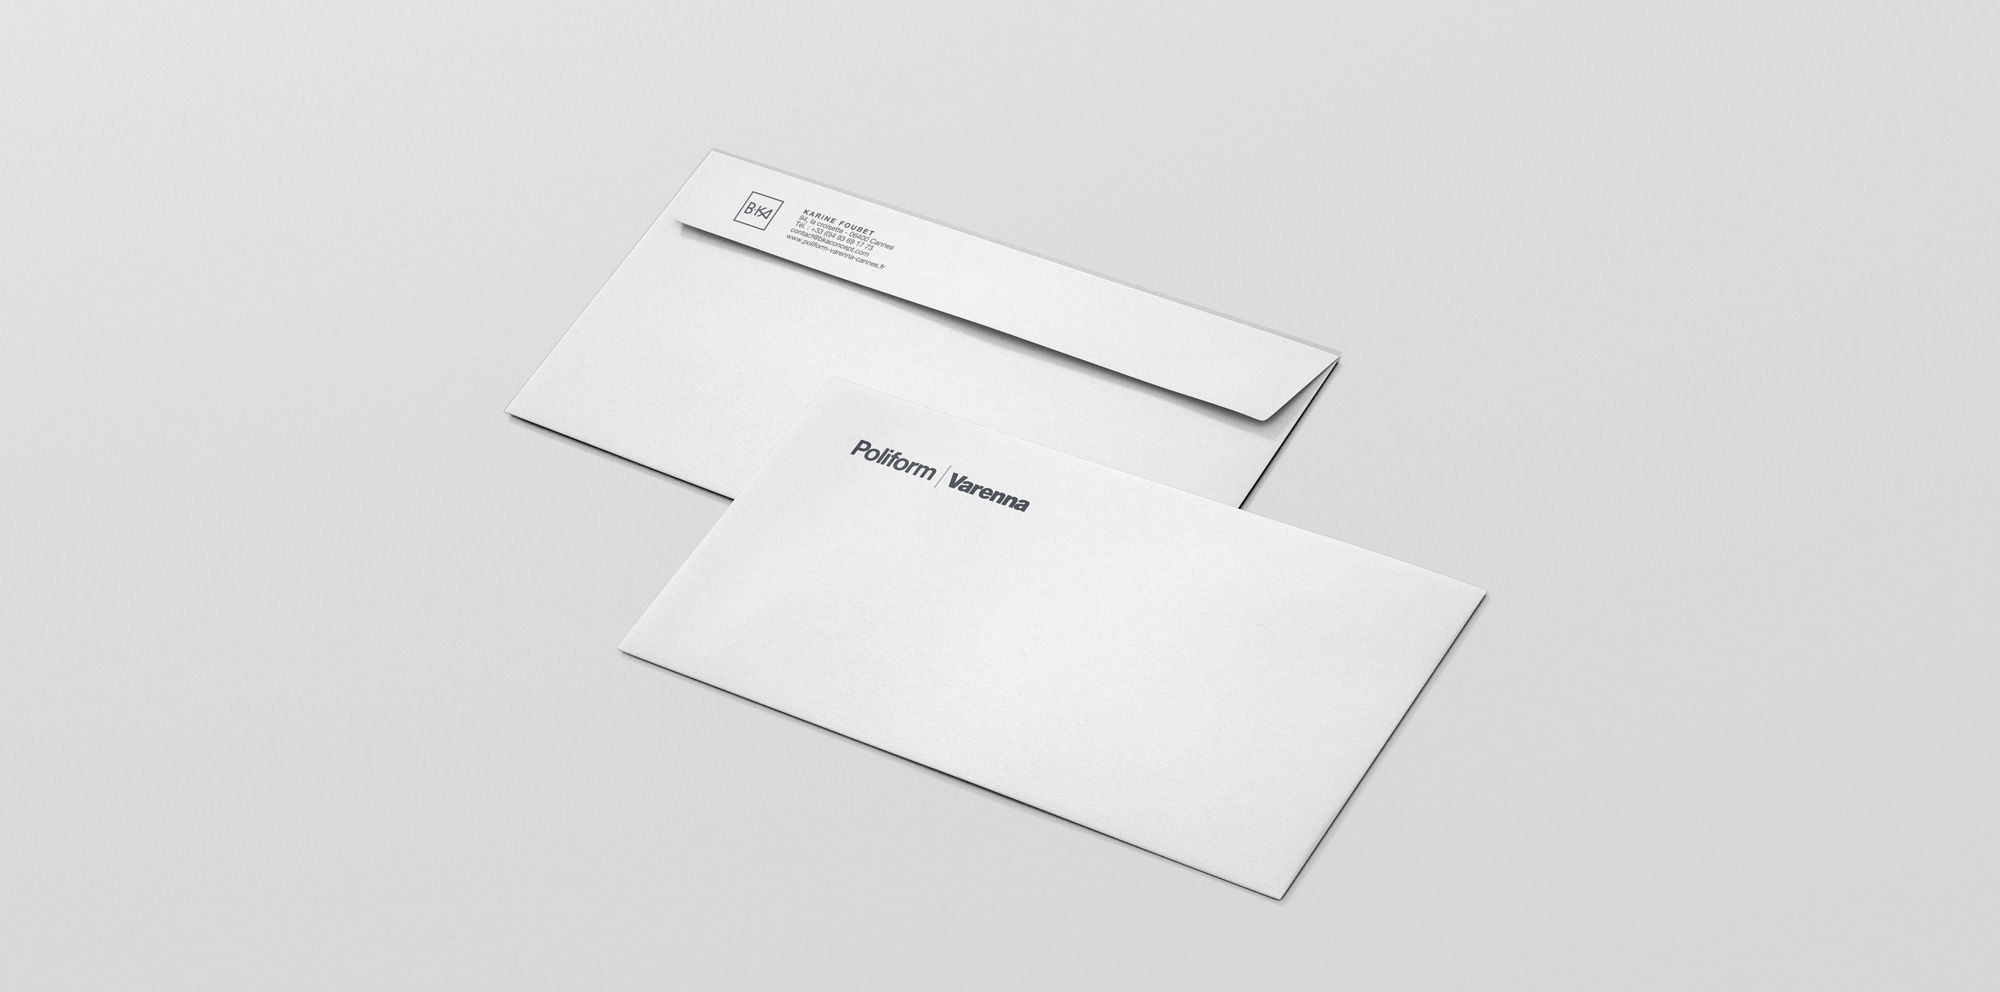 Enveloppe-Mockup-BKA